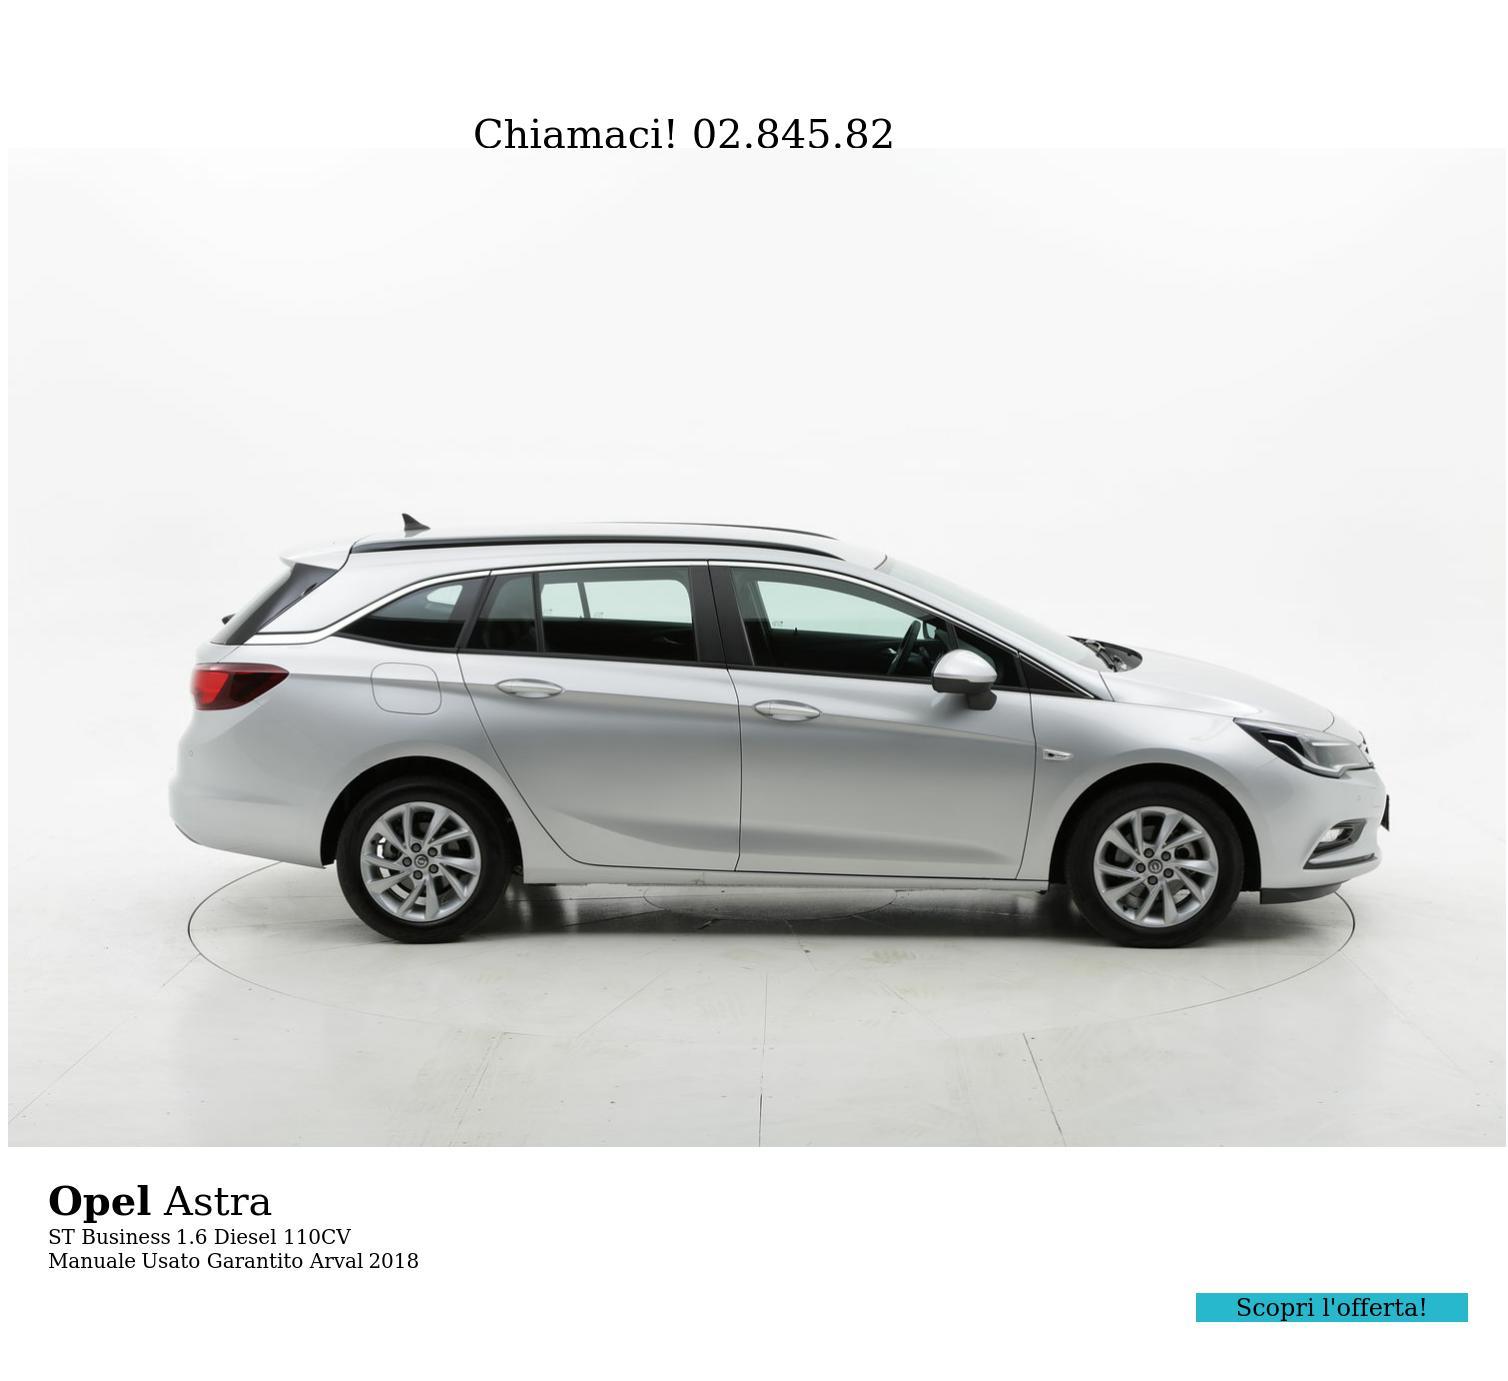 Opel Astra ST Business km 0 diesel argento   brumbrum